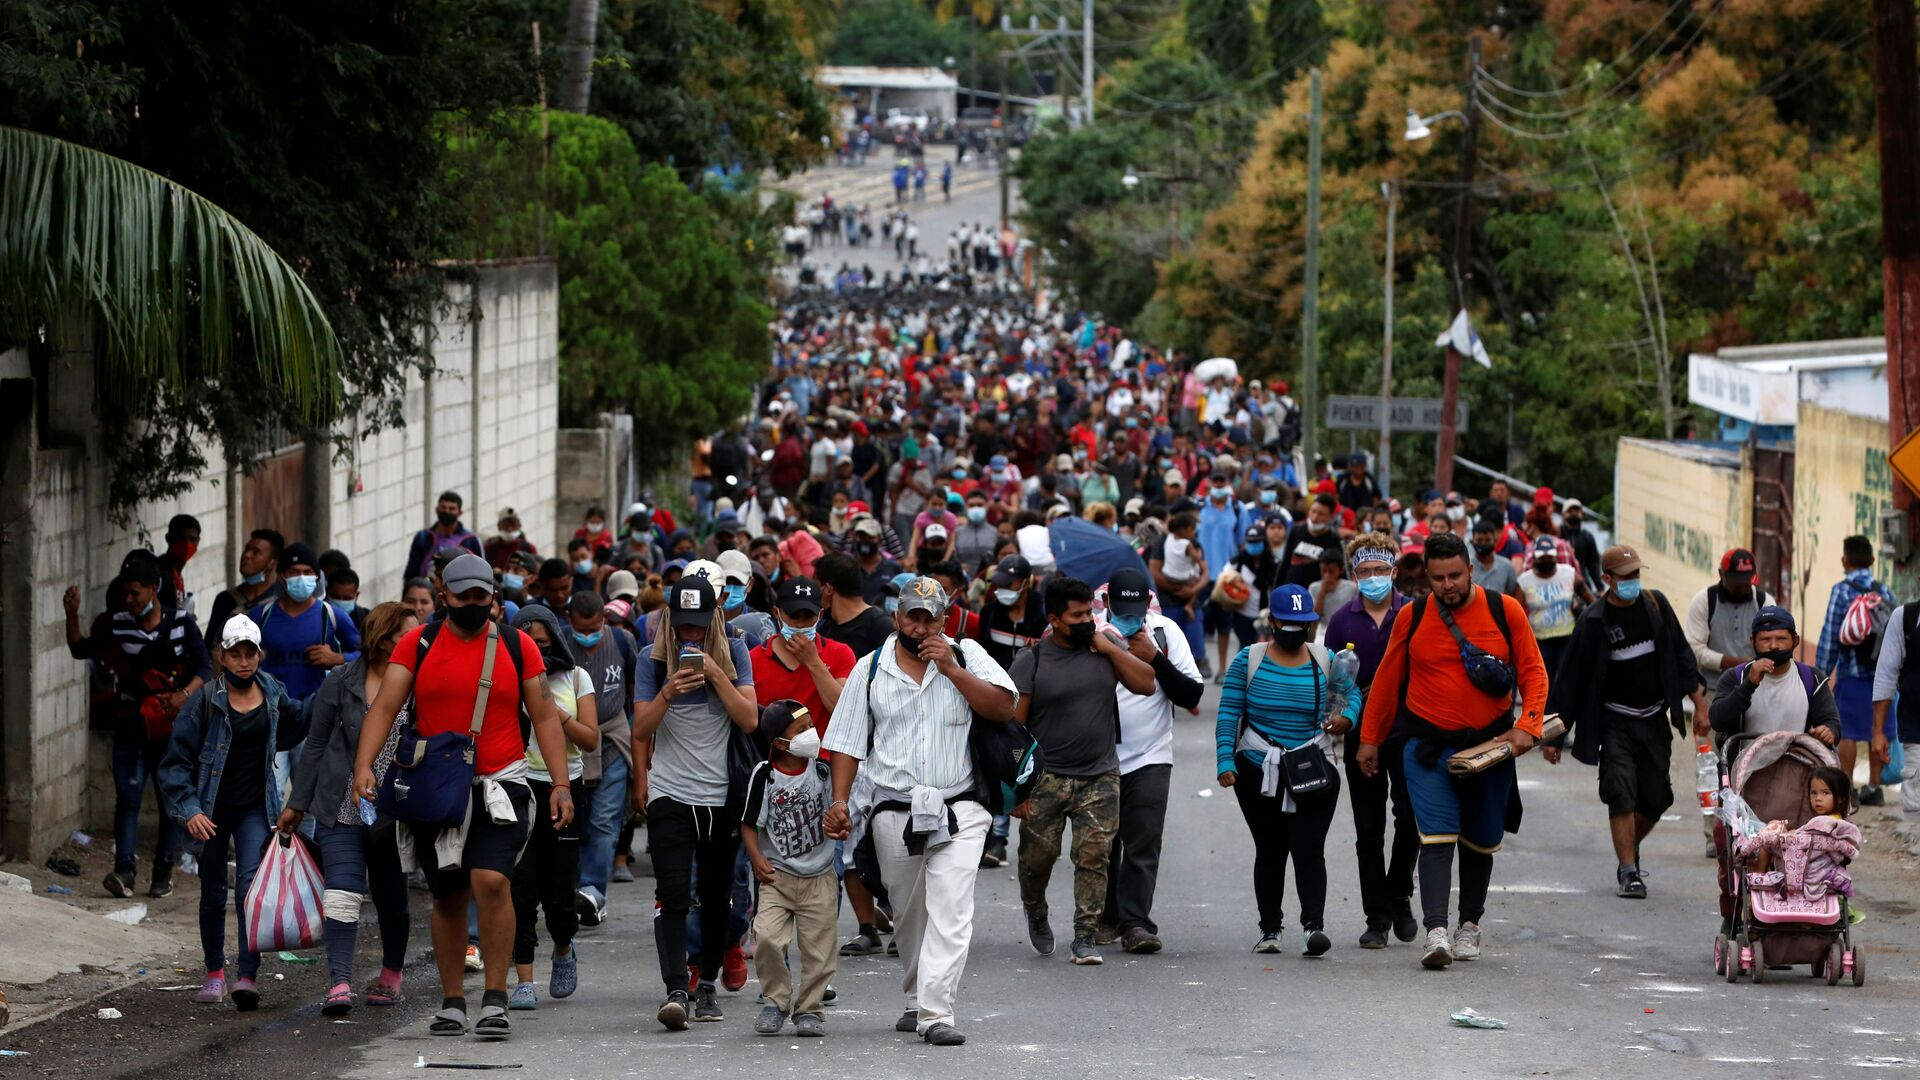 Caravana de migrantes hondureños  - Sputnik Mundo, 1920, 27.02.2021